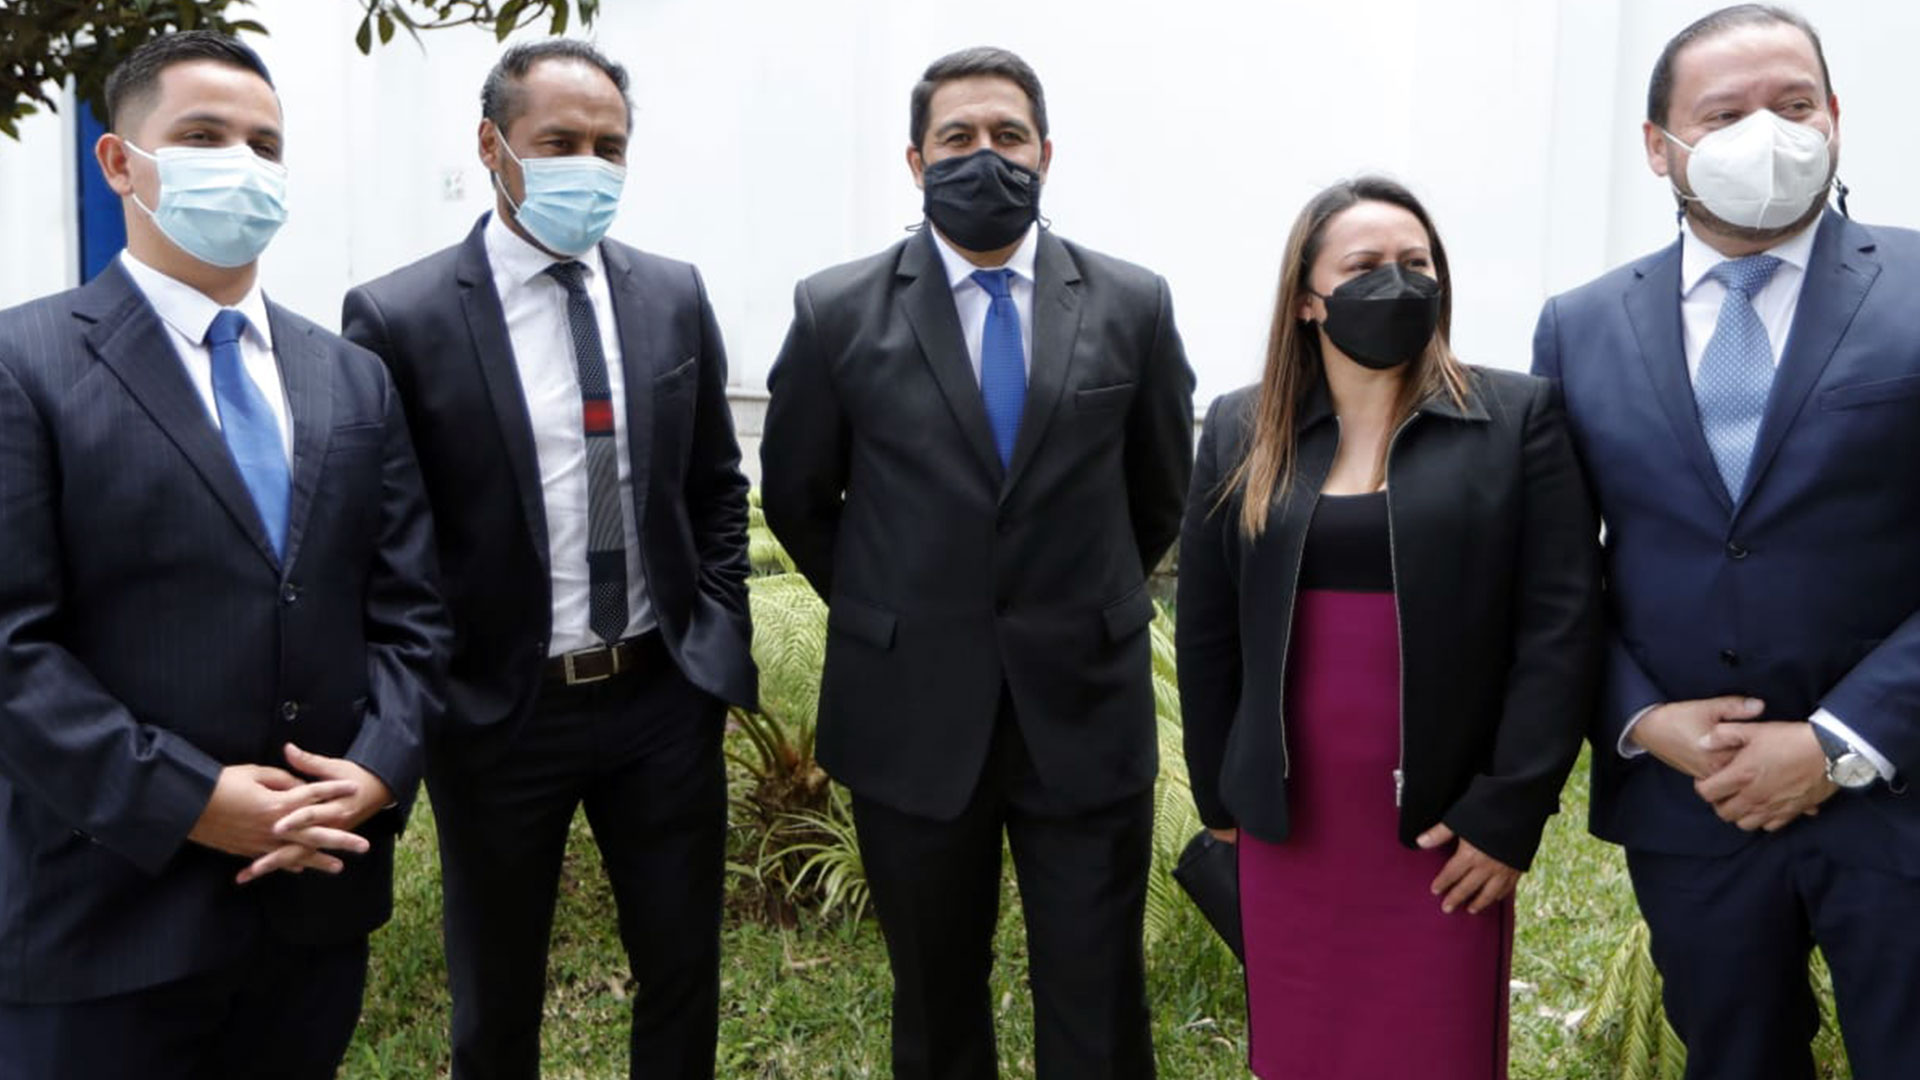 Comité Olímpico de Guatemala tiene nuevo presidente virtual, exfutbolista Jorge Rodas - Prensa Libre